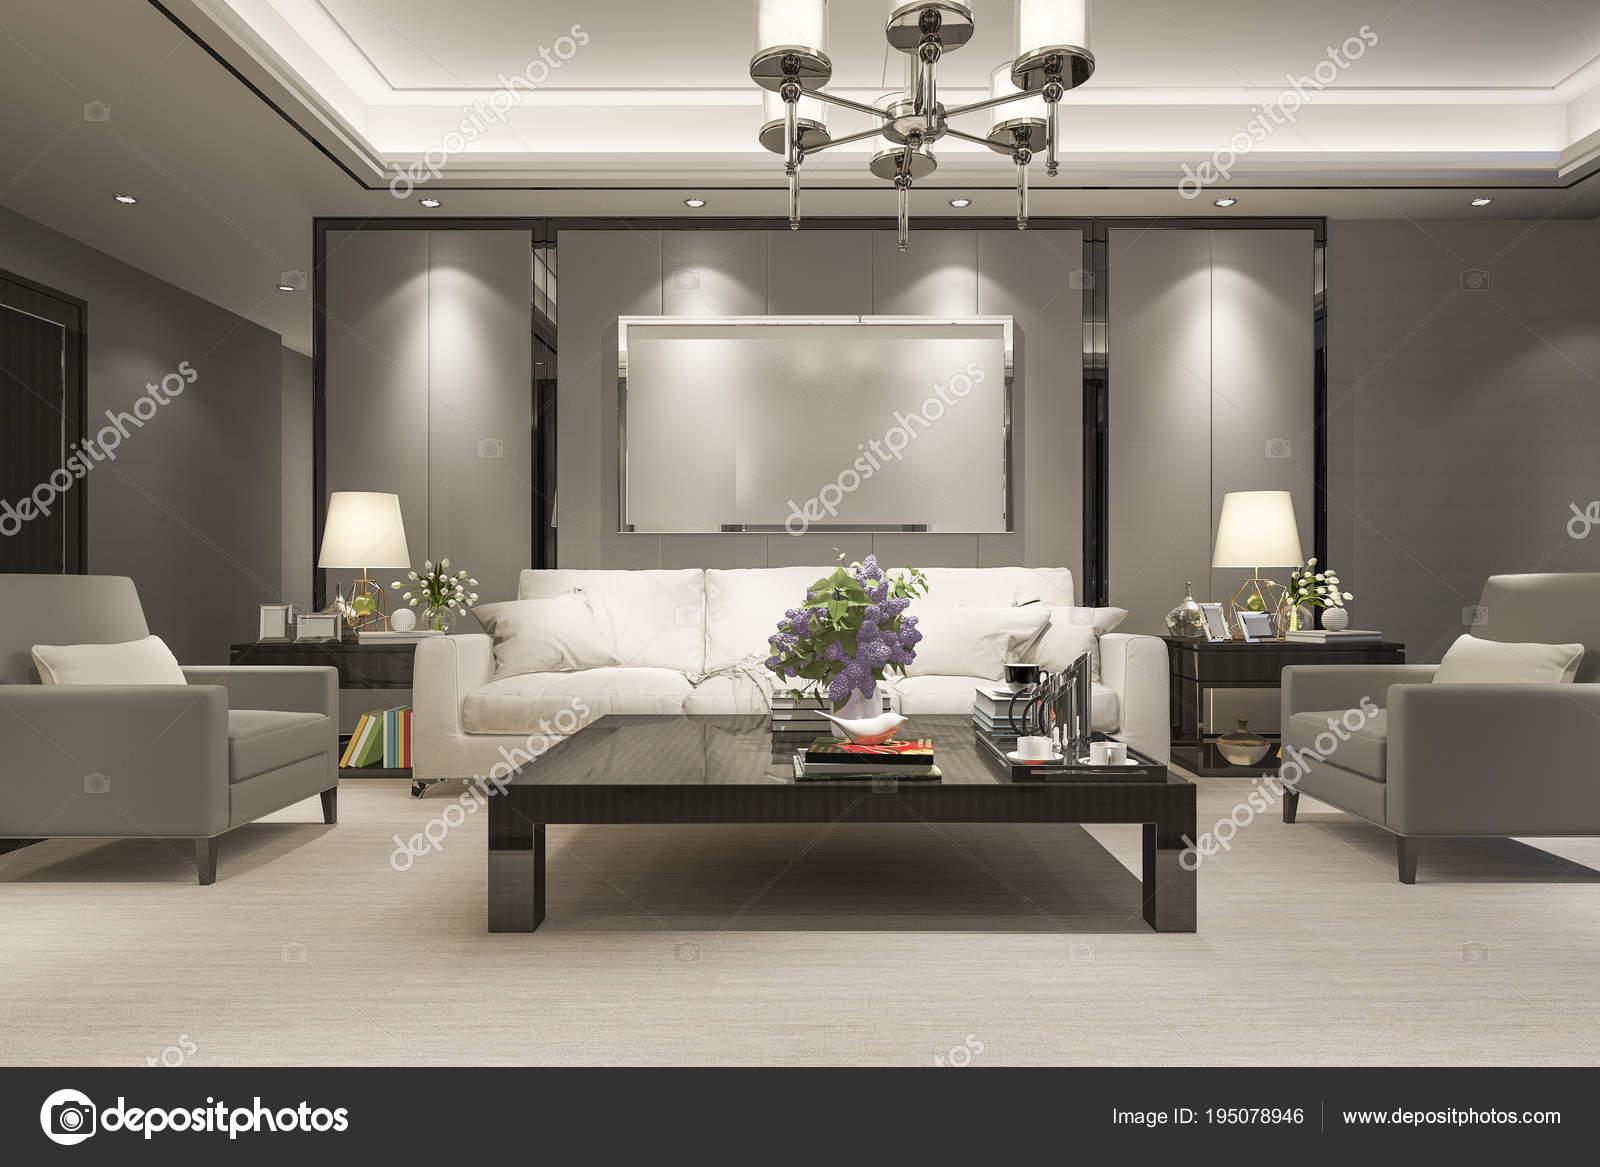 Rendering Luxury Modern Living Room Dining Room Stock Photo Image By C Dit26978 195078946